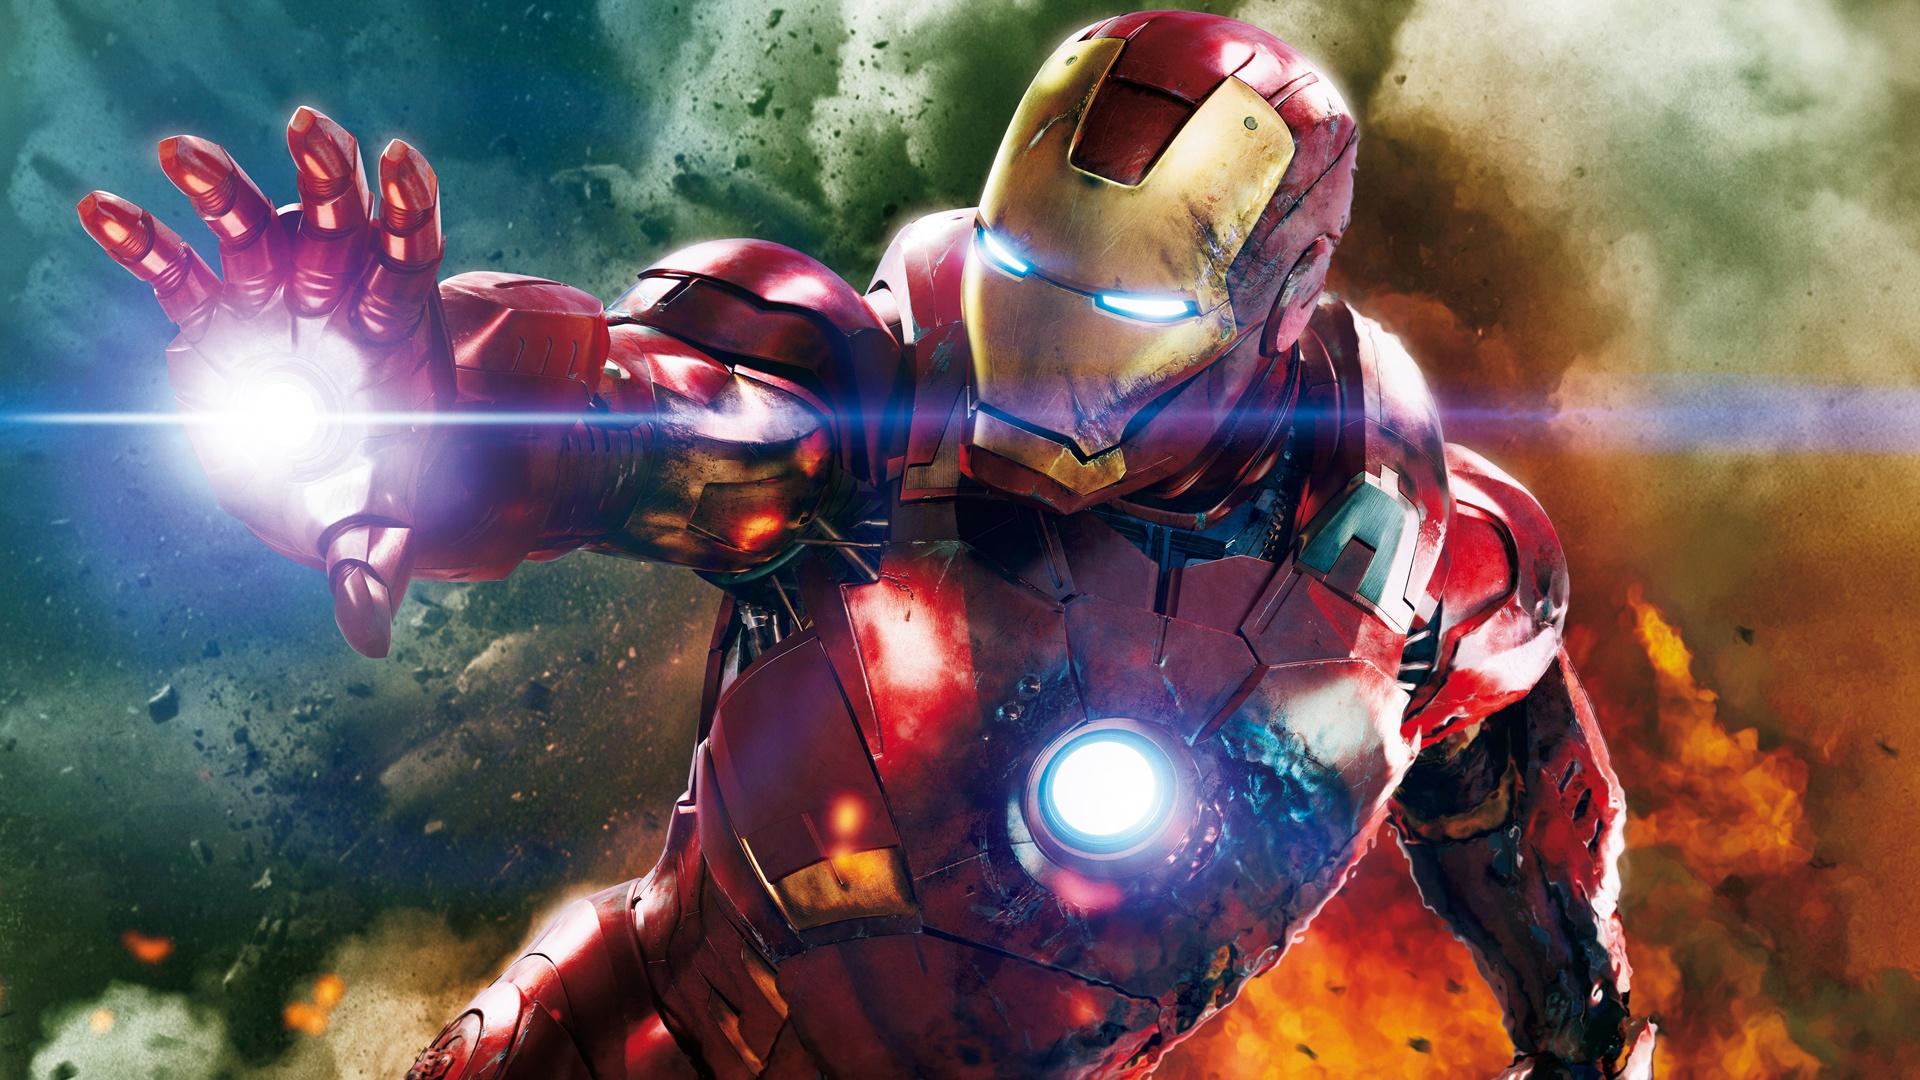 Iron Man 3 Wallpaper 1080pHD Wallpapers 1920x1080